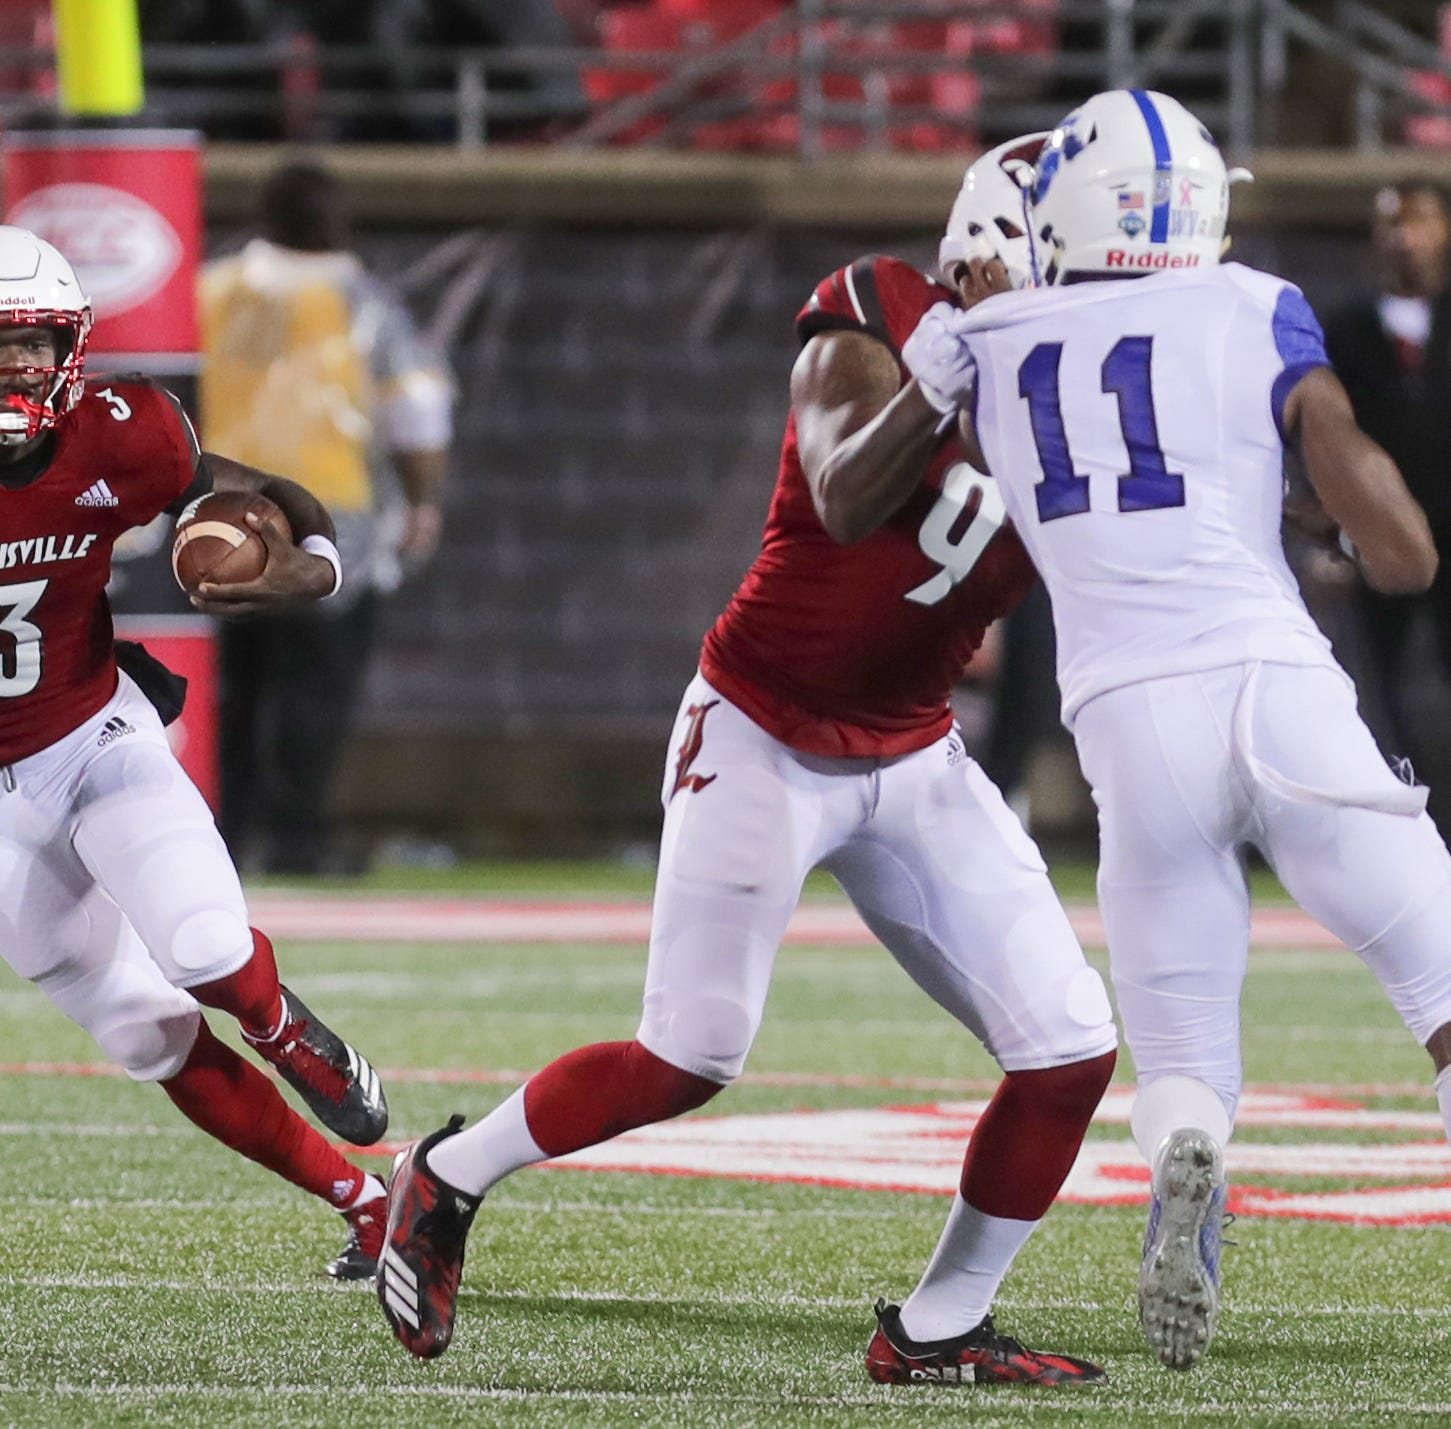 Louisville's Malik Cunningham on starting at QB: 'I've been waiting'